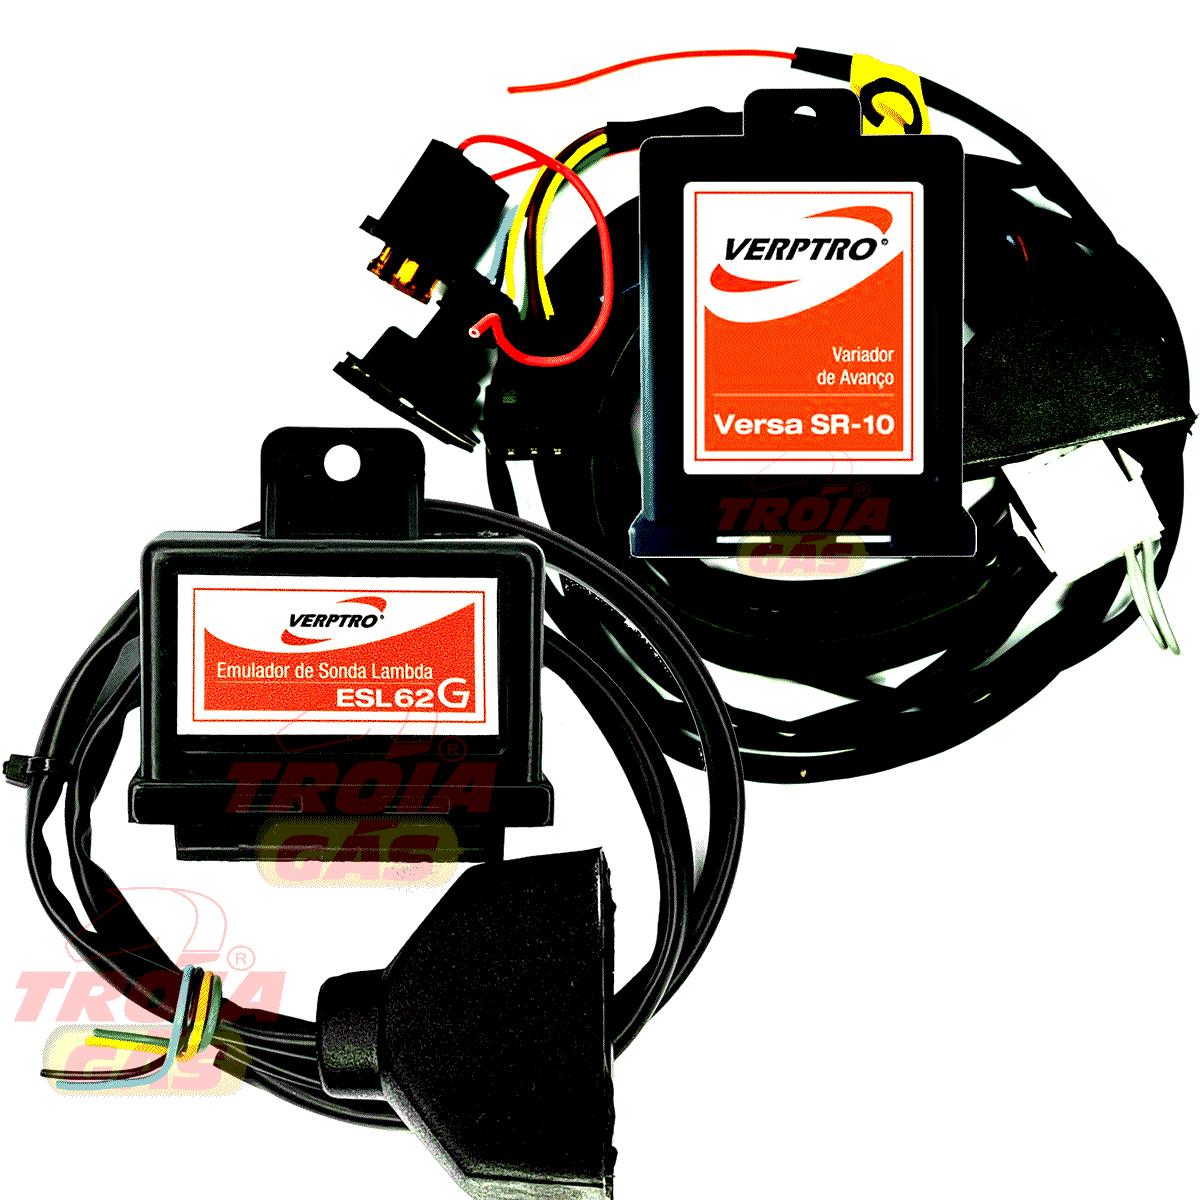 Kit Simulador Sonda Gasolina Variador Verptro ESL62G Versa SR10